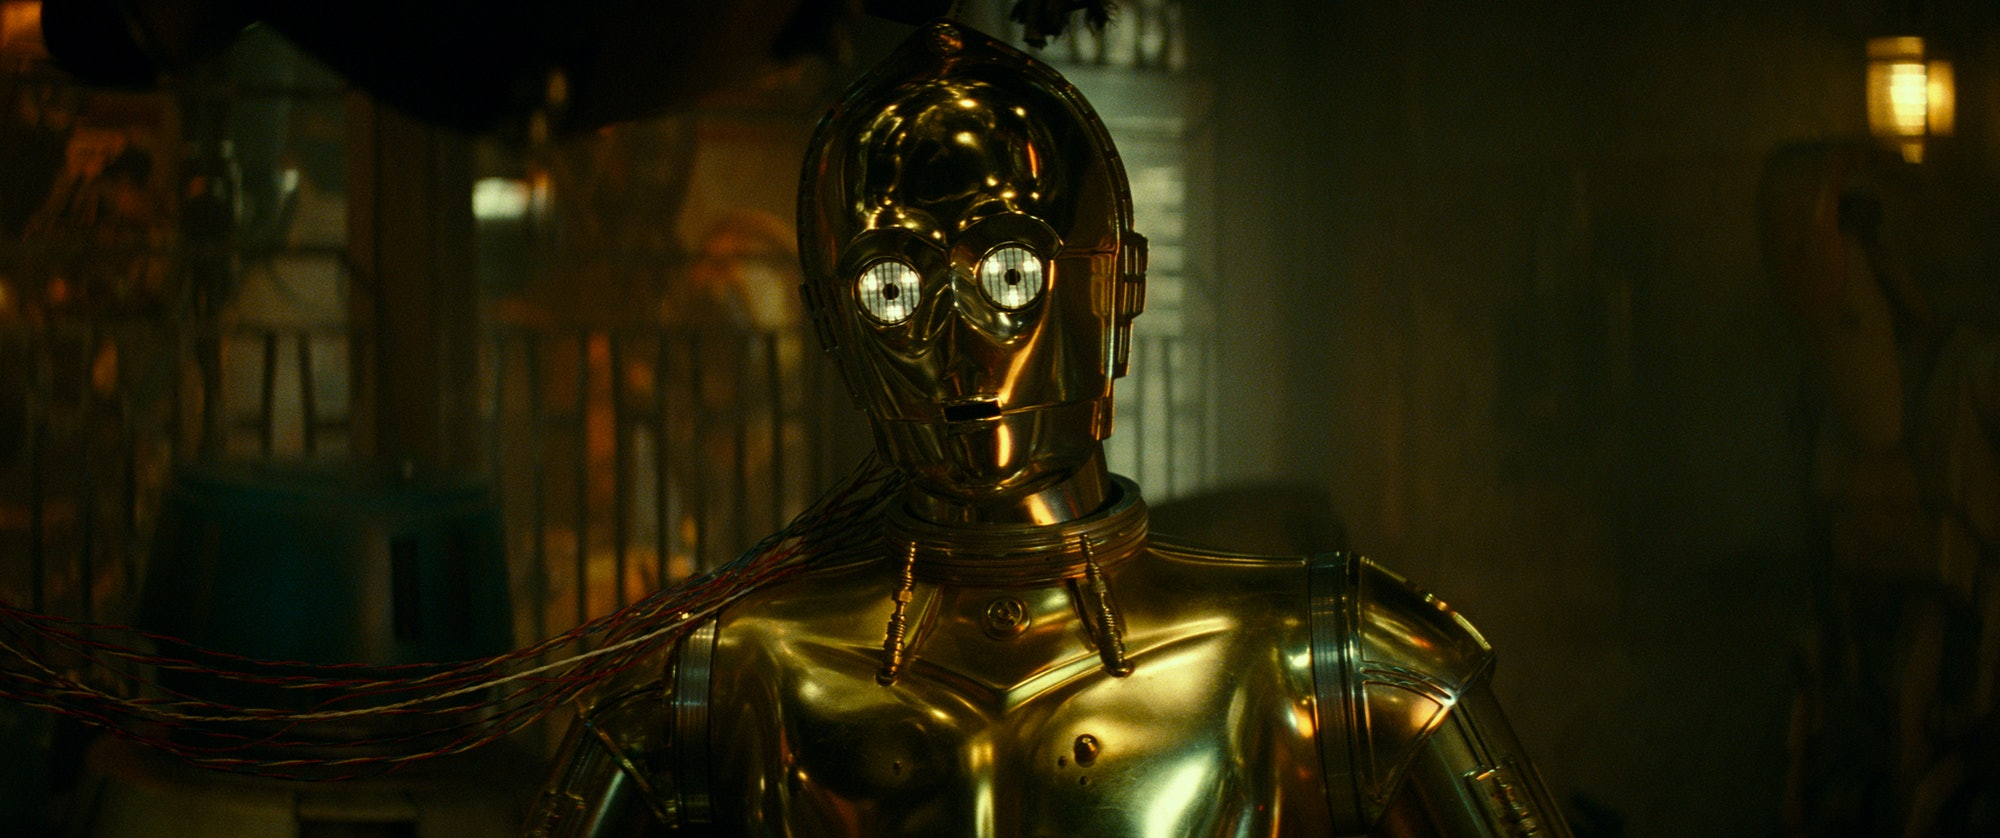 C-3PO droid Rise of Skywalker